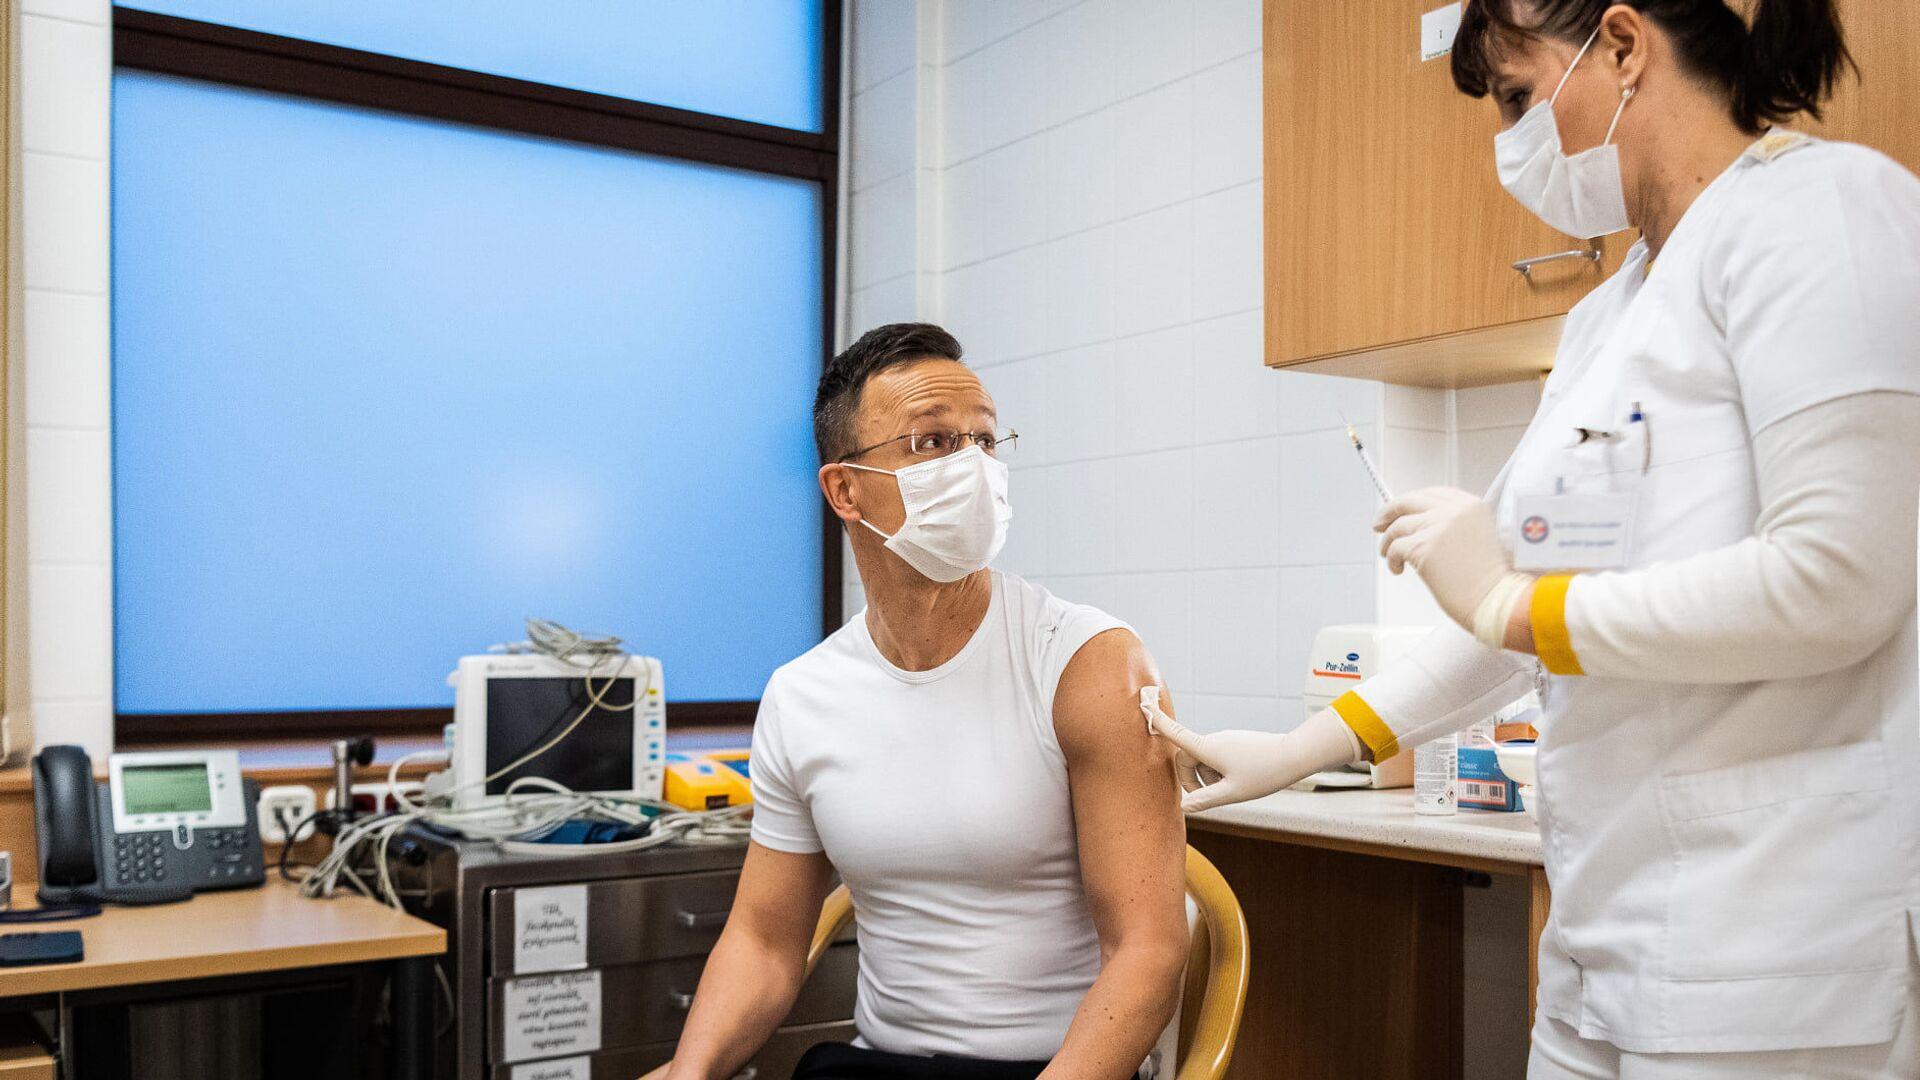 Hungarian Foreign Minister Peter Szijjarto gets innoculated with Russia's Sputnik V vaccine against COVID-19 - Sputnik Italia, 1920, 20.03.2021